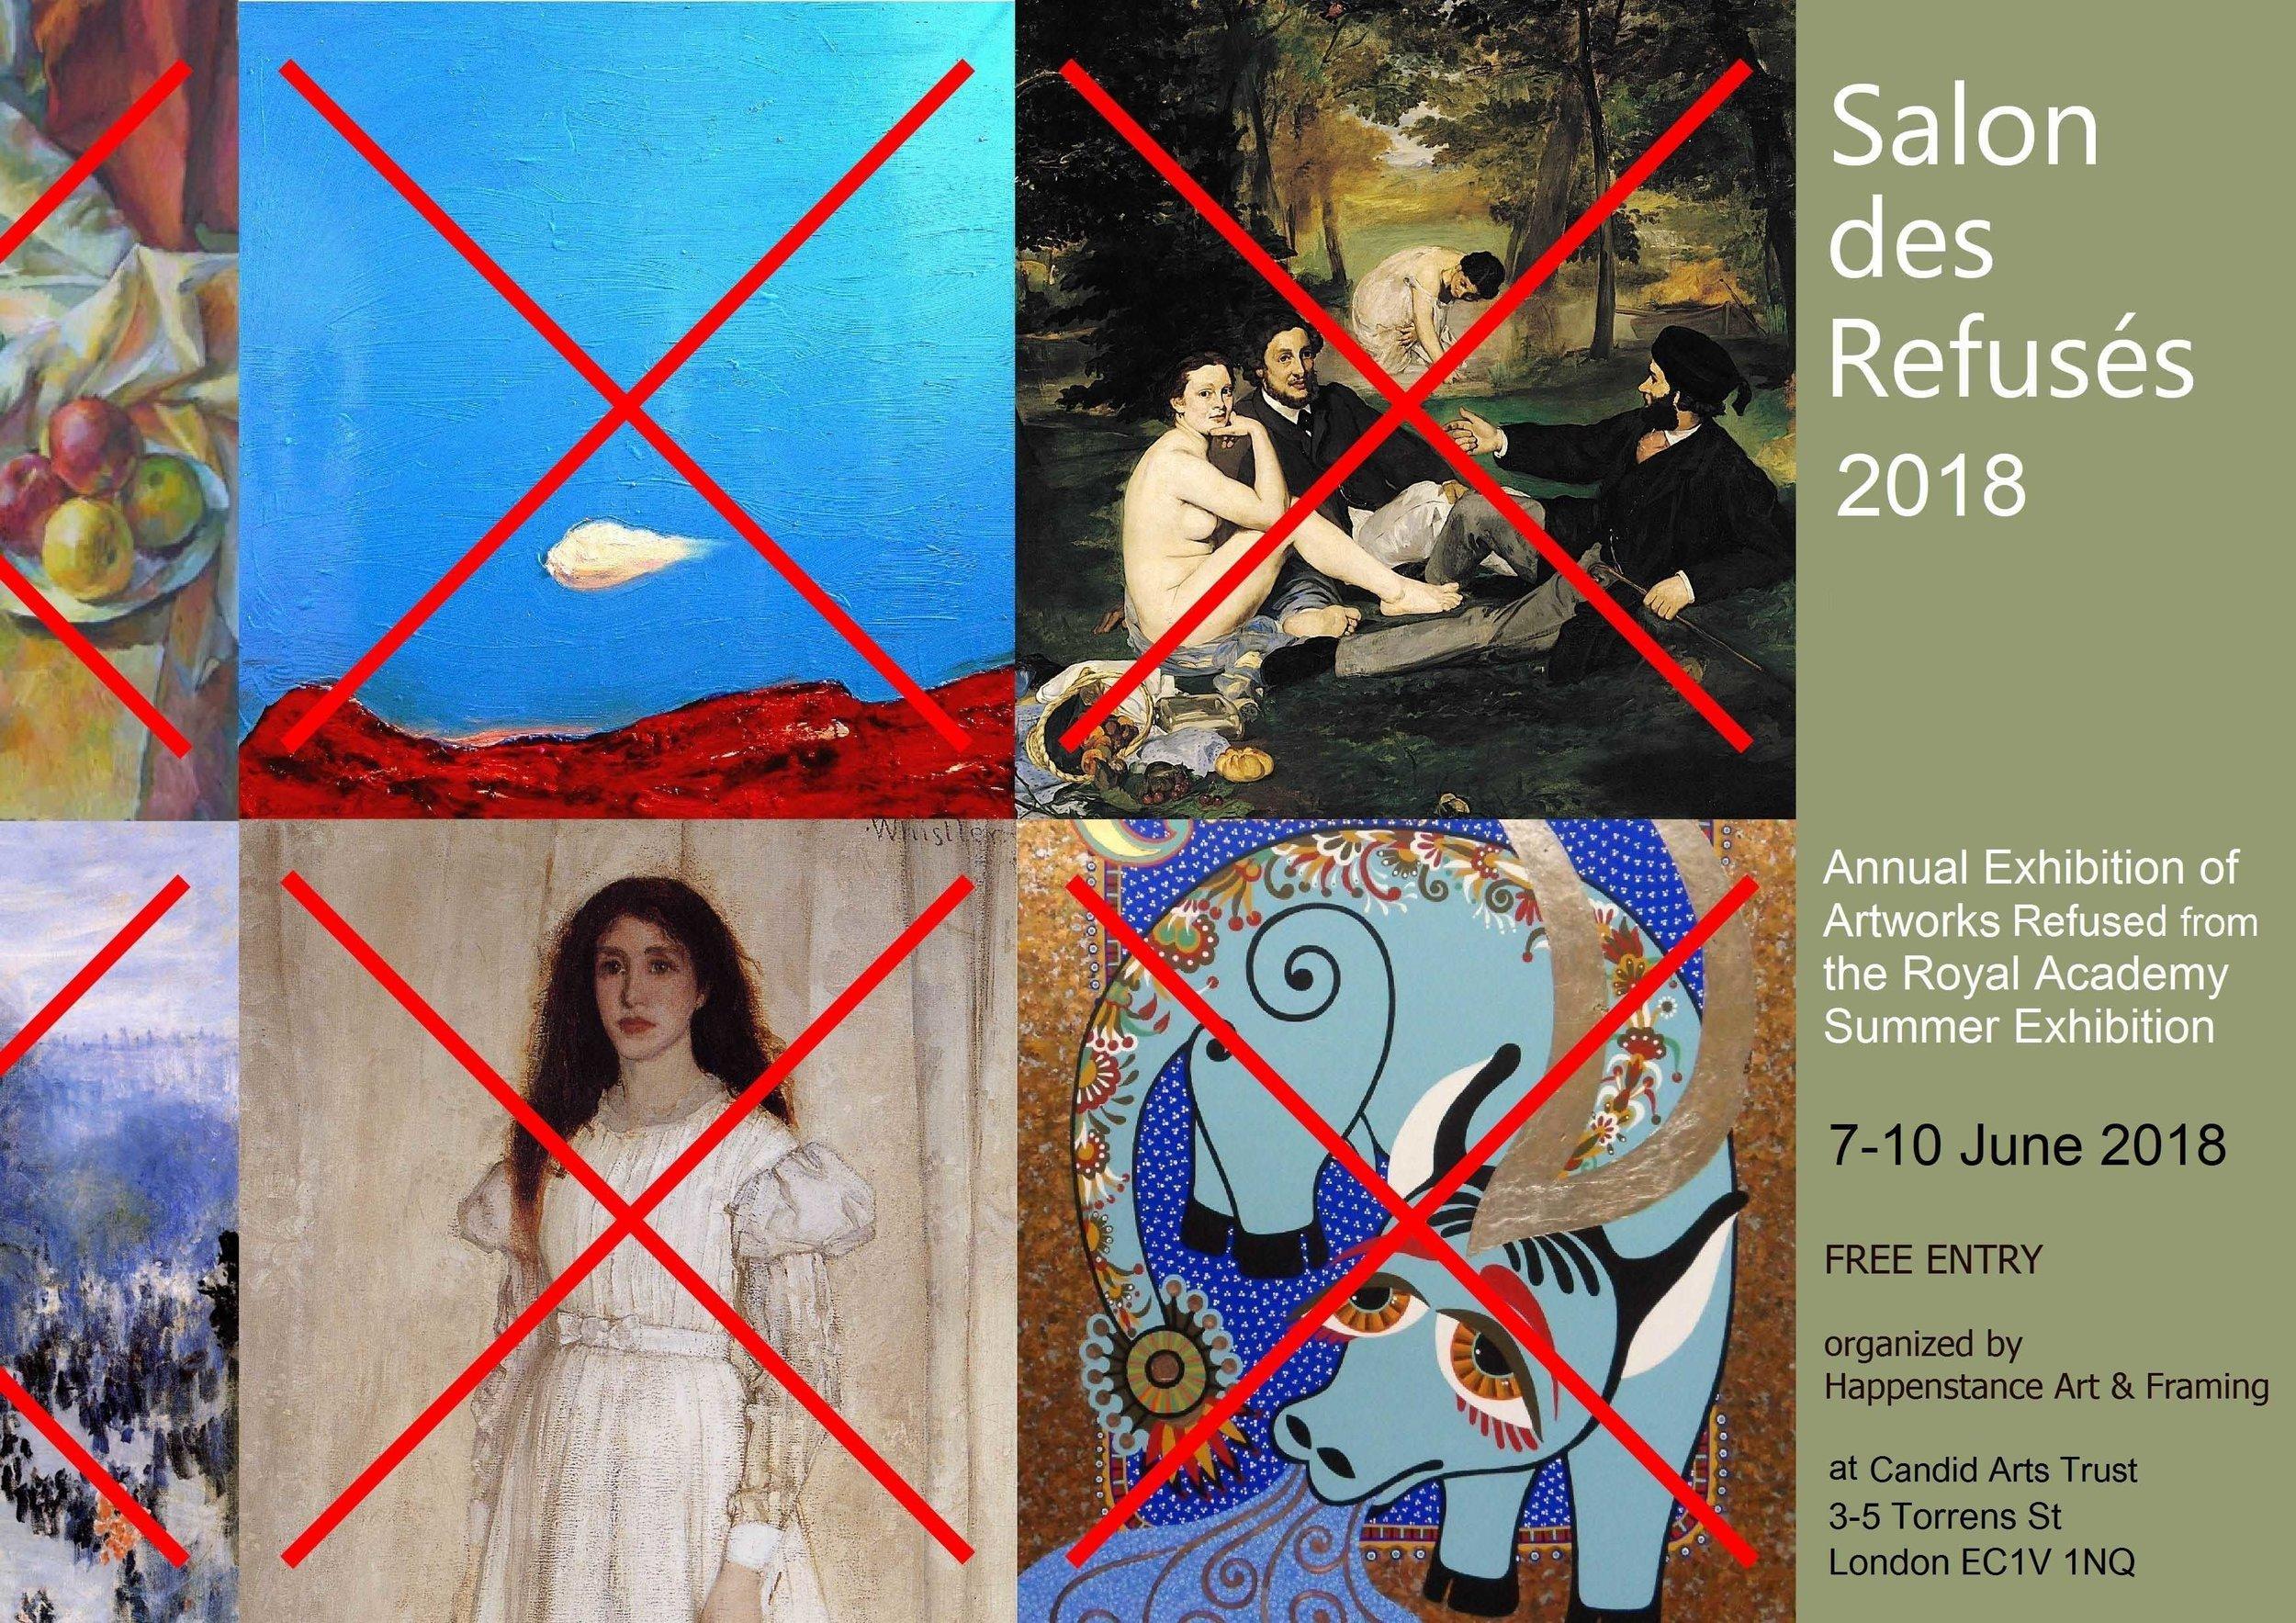 Salon des Refuses 2018 Invitation -min.jpg